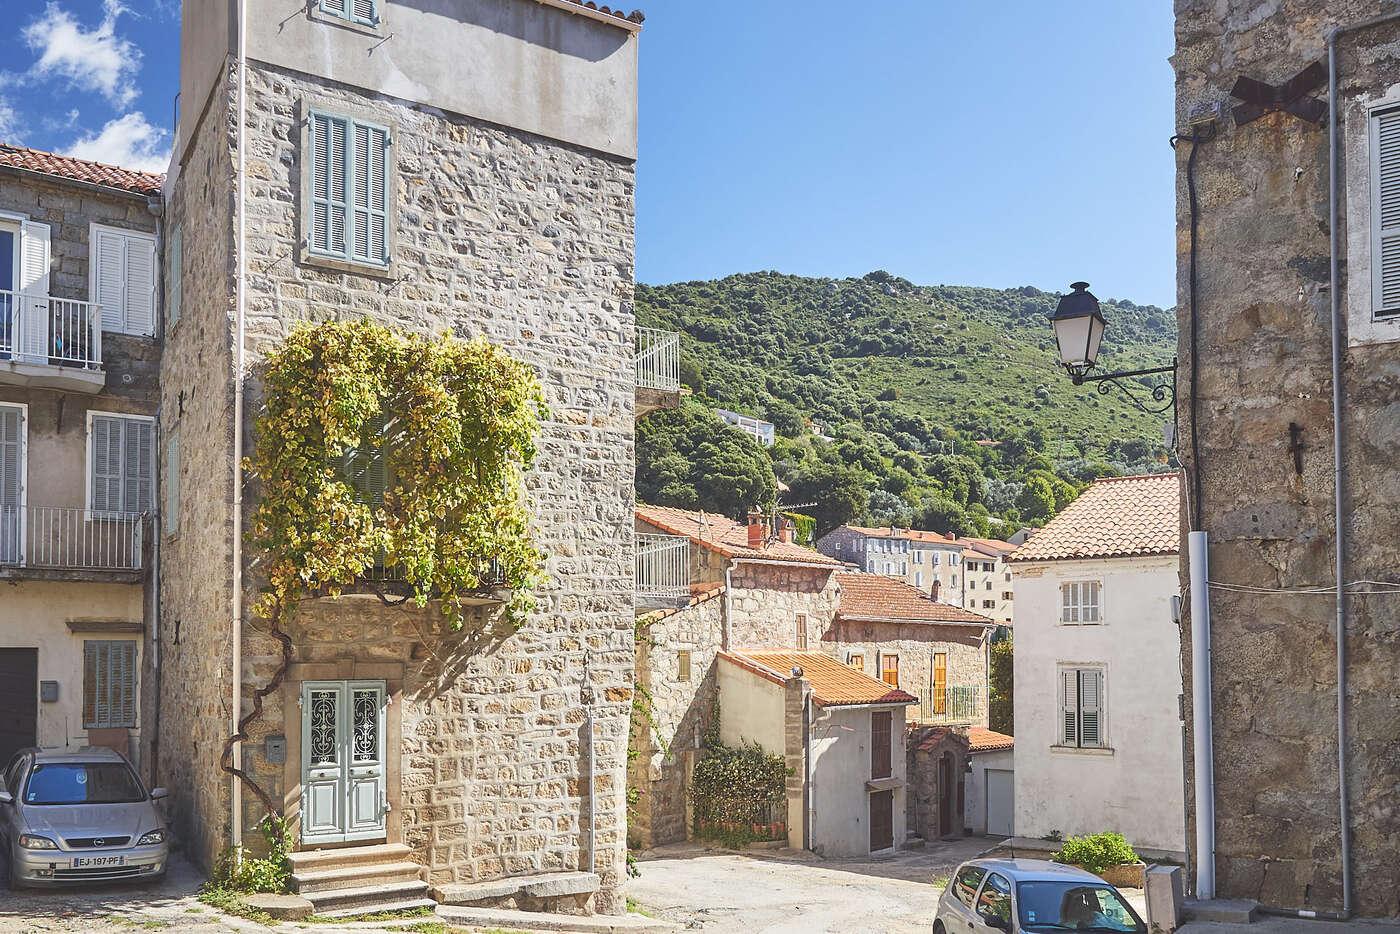 Rues de Sainte-Lucie-de-Tallano, en Corse